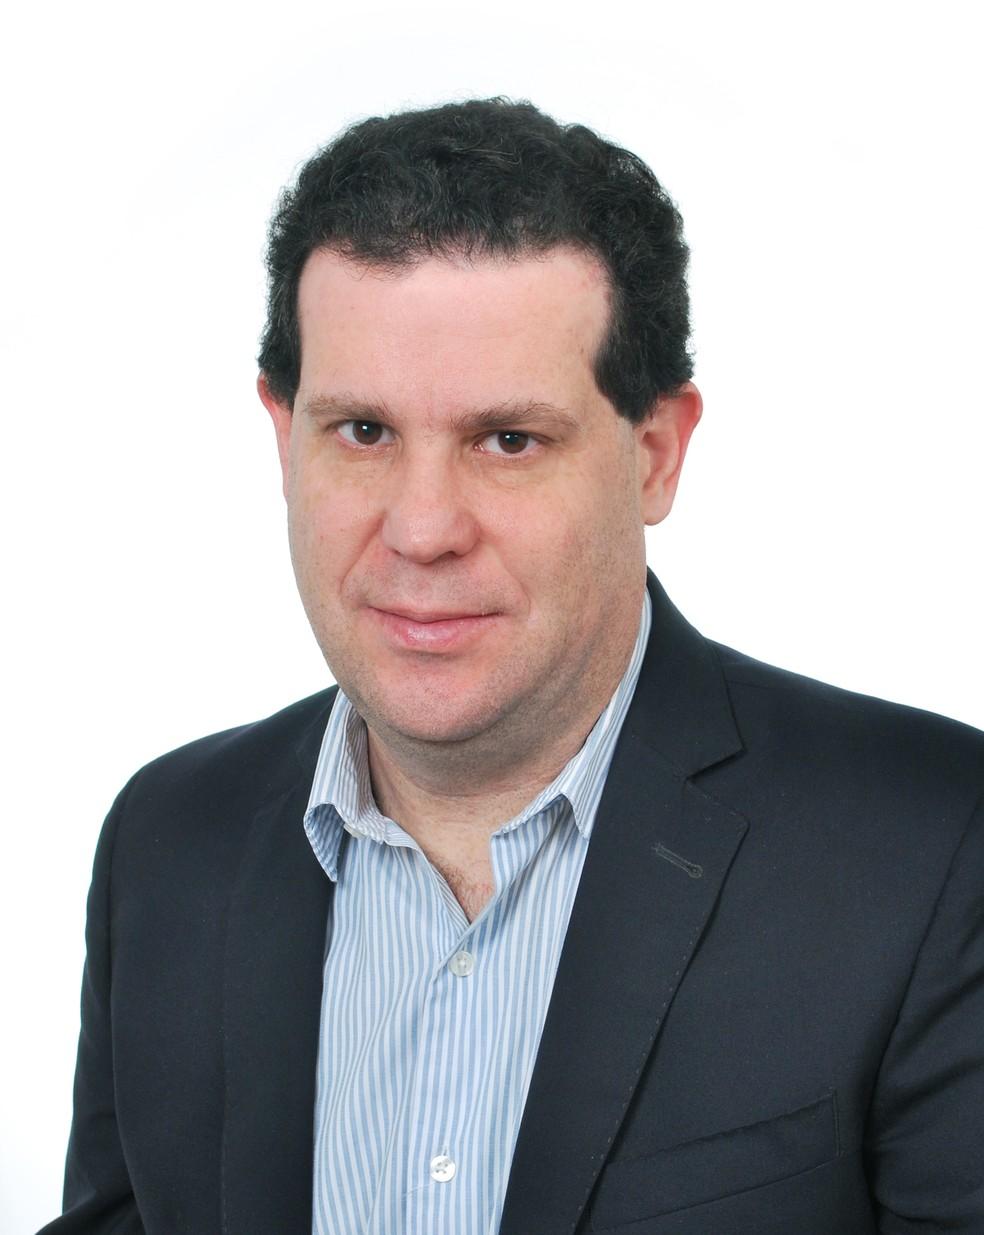 Dr. Beni M. Grinblat (CRM 84426/SP) — Foto: Divulgação